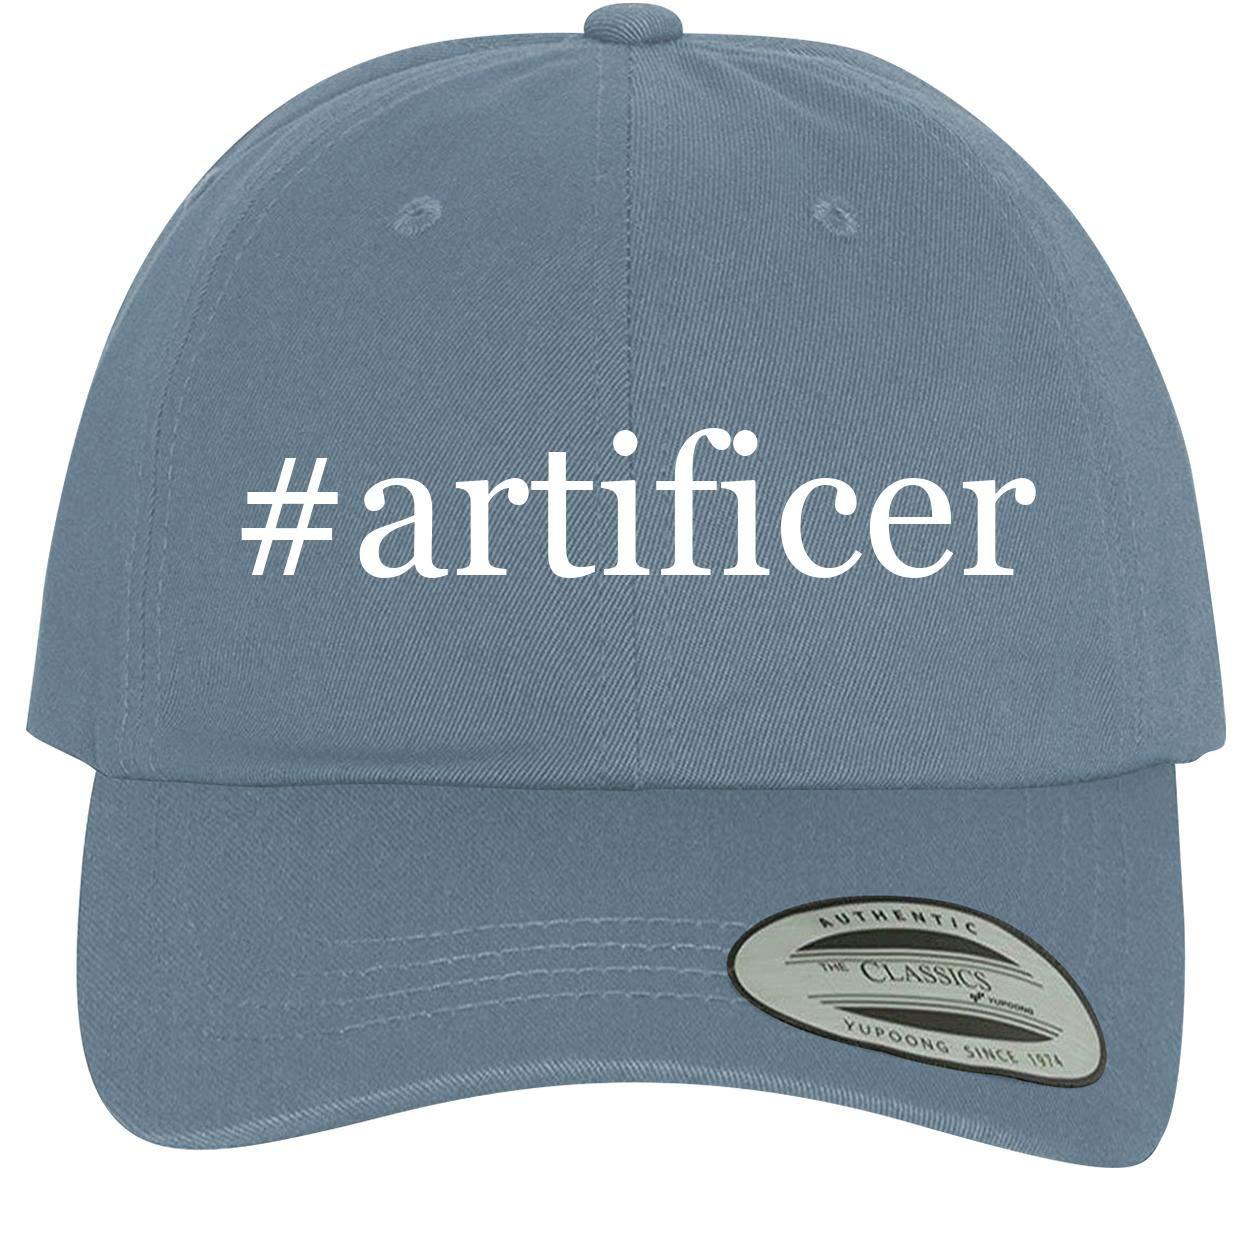 Comfortable Dad Hat Baseball Cap BH Cool Designs #Artificer